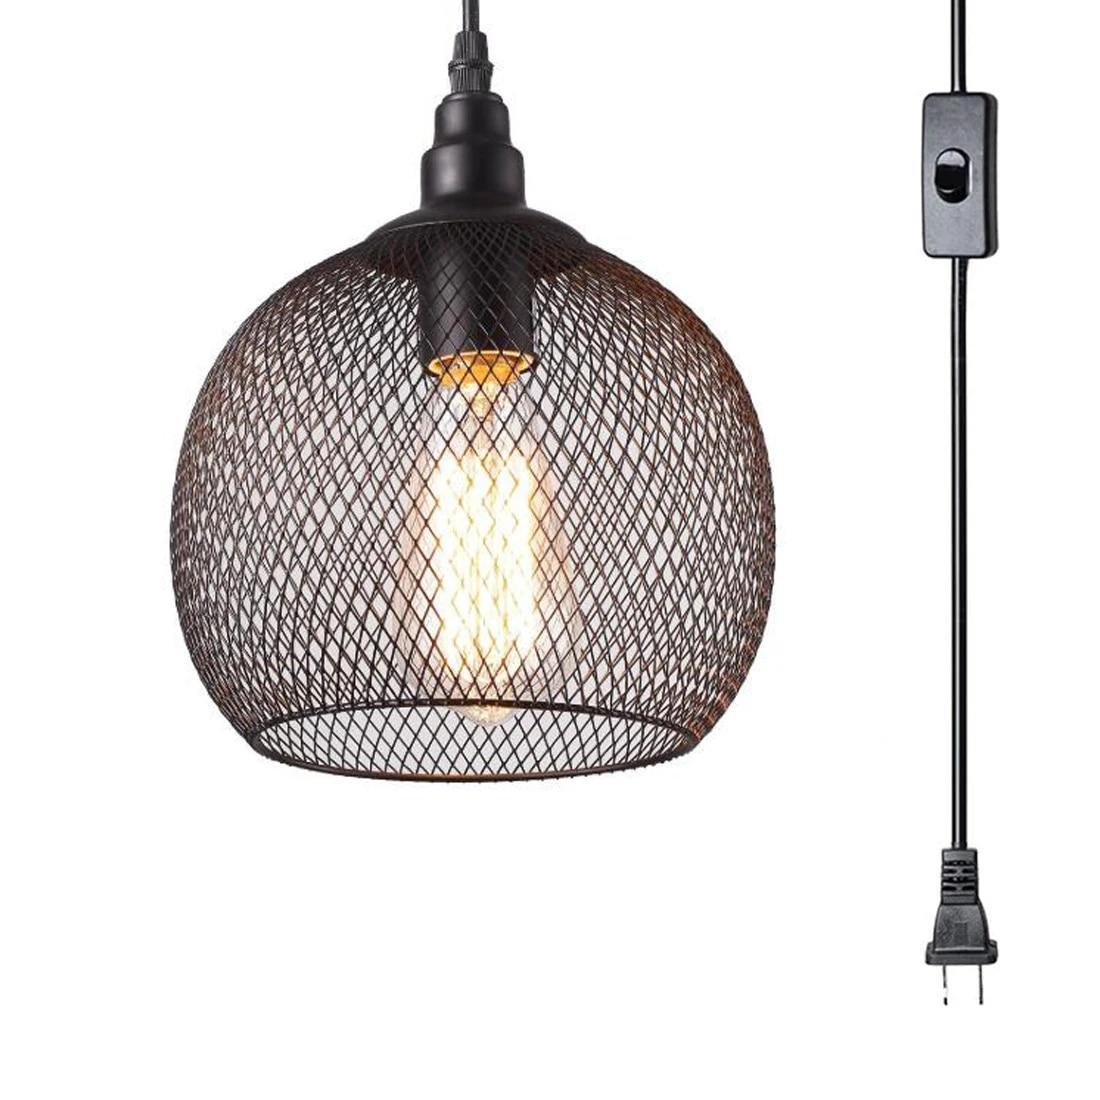 Inverted Pendant Dining Room Light Fixtures Plug In Ceiling Light Industrial Pendant Light Cheap Industrial Ceiling Light Pendant Lights Aliexpress